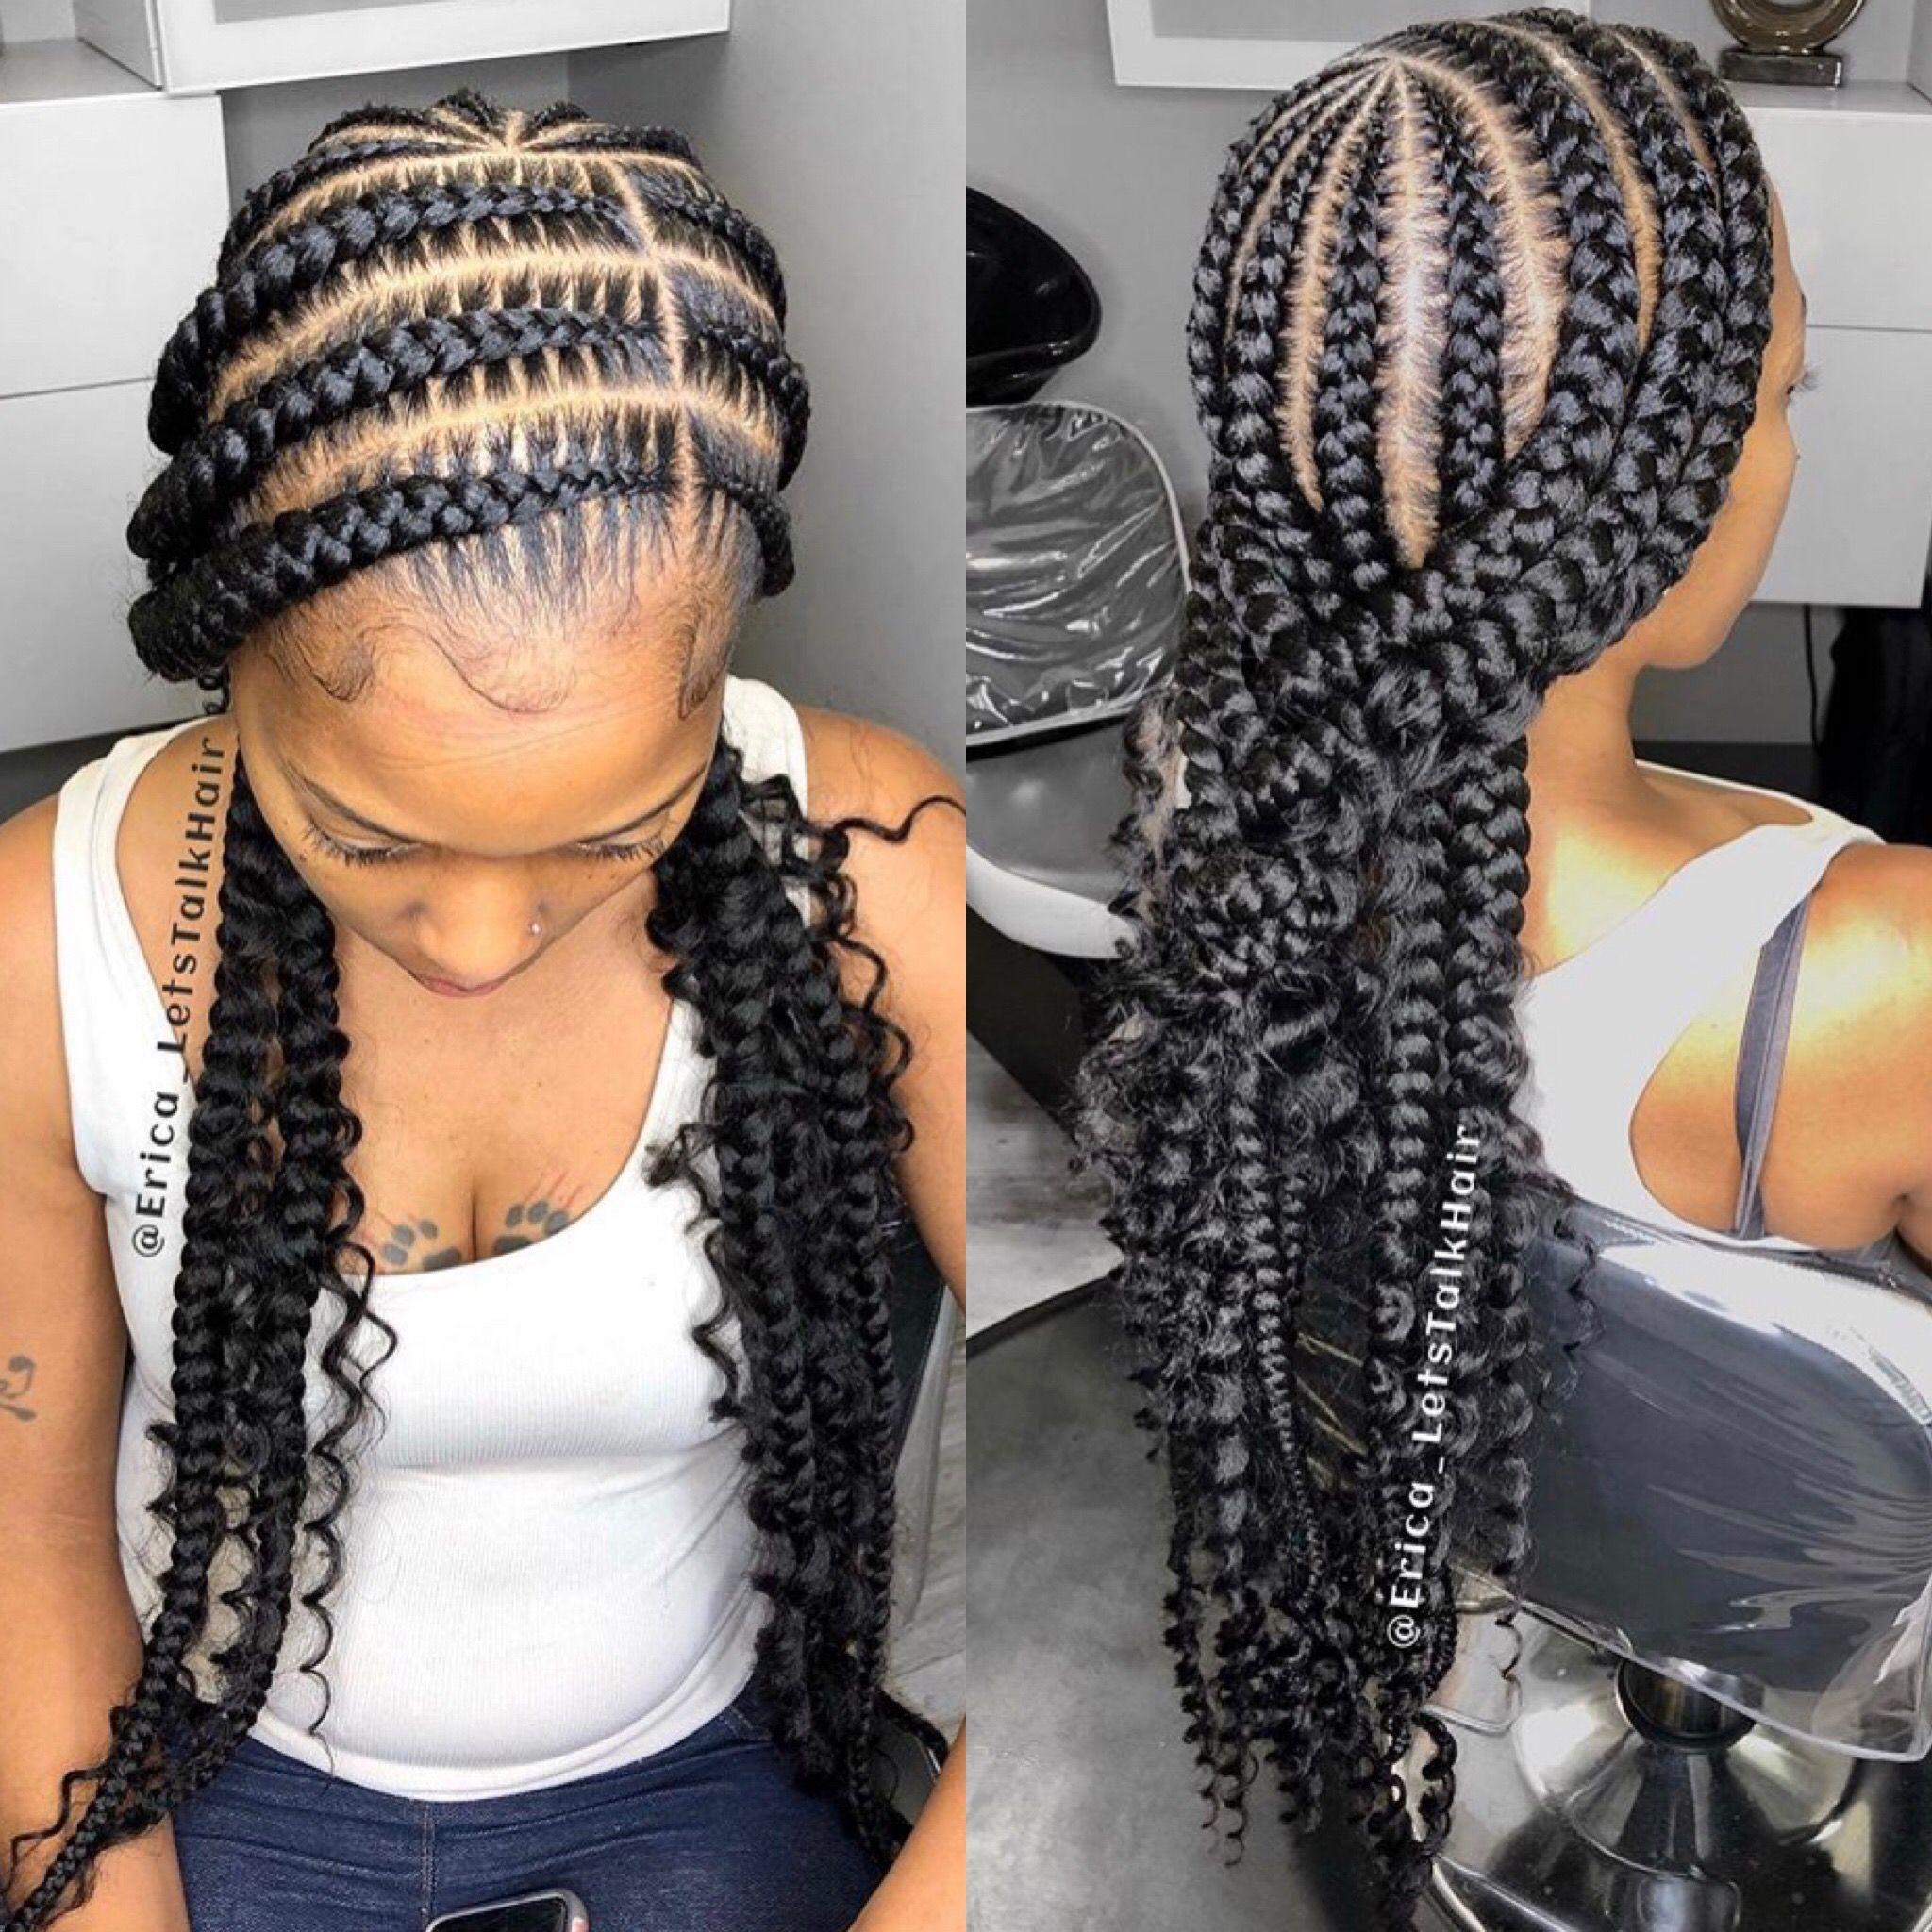 How To Create Ghana Cornrow Braids For Beginners hairstyleforblackwomen.net 22